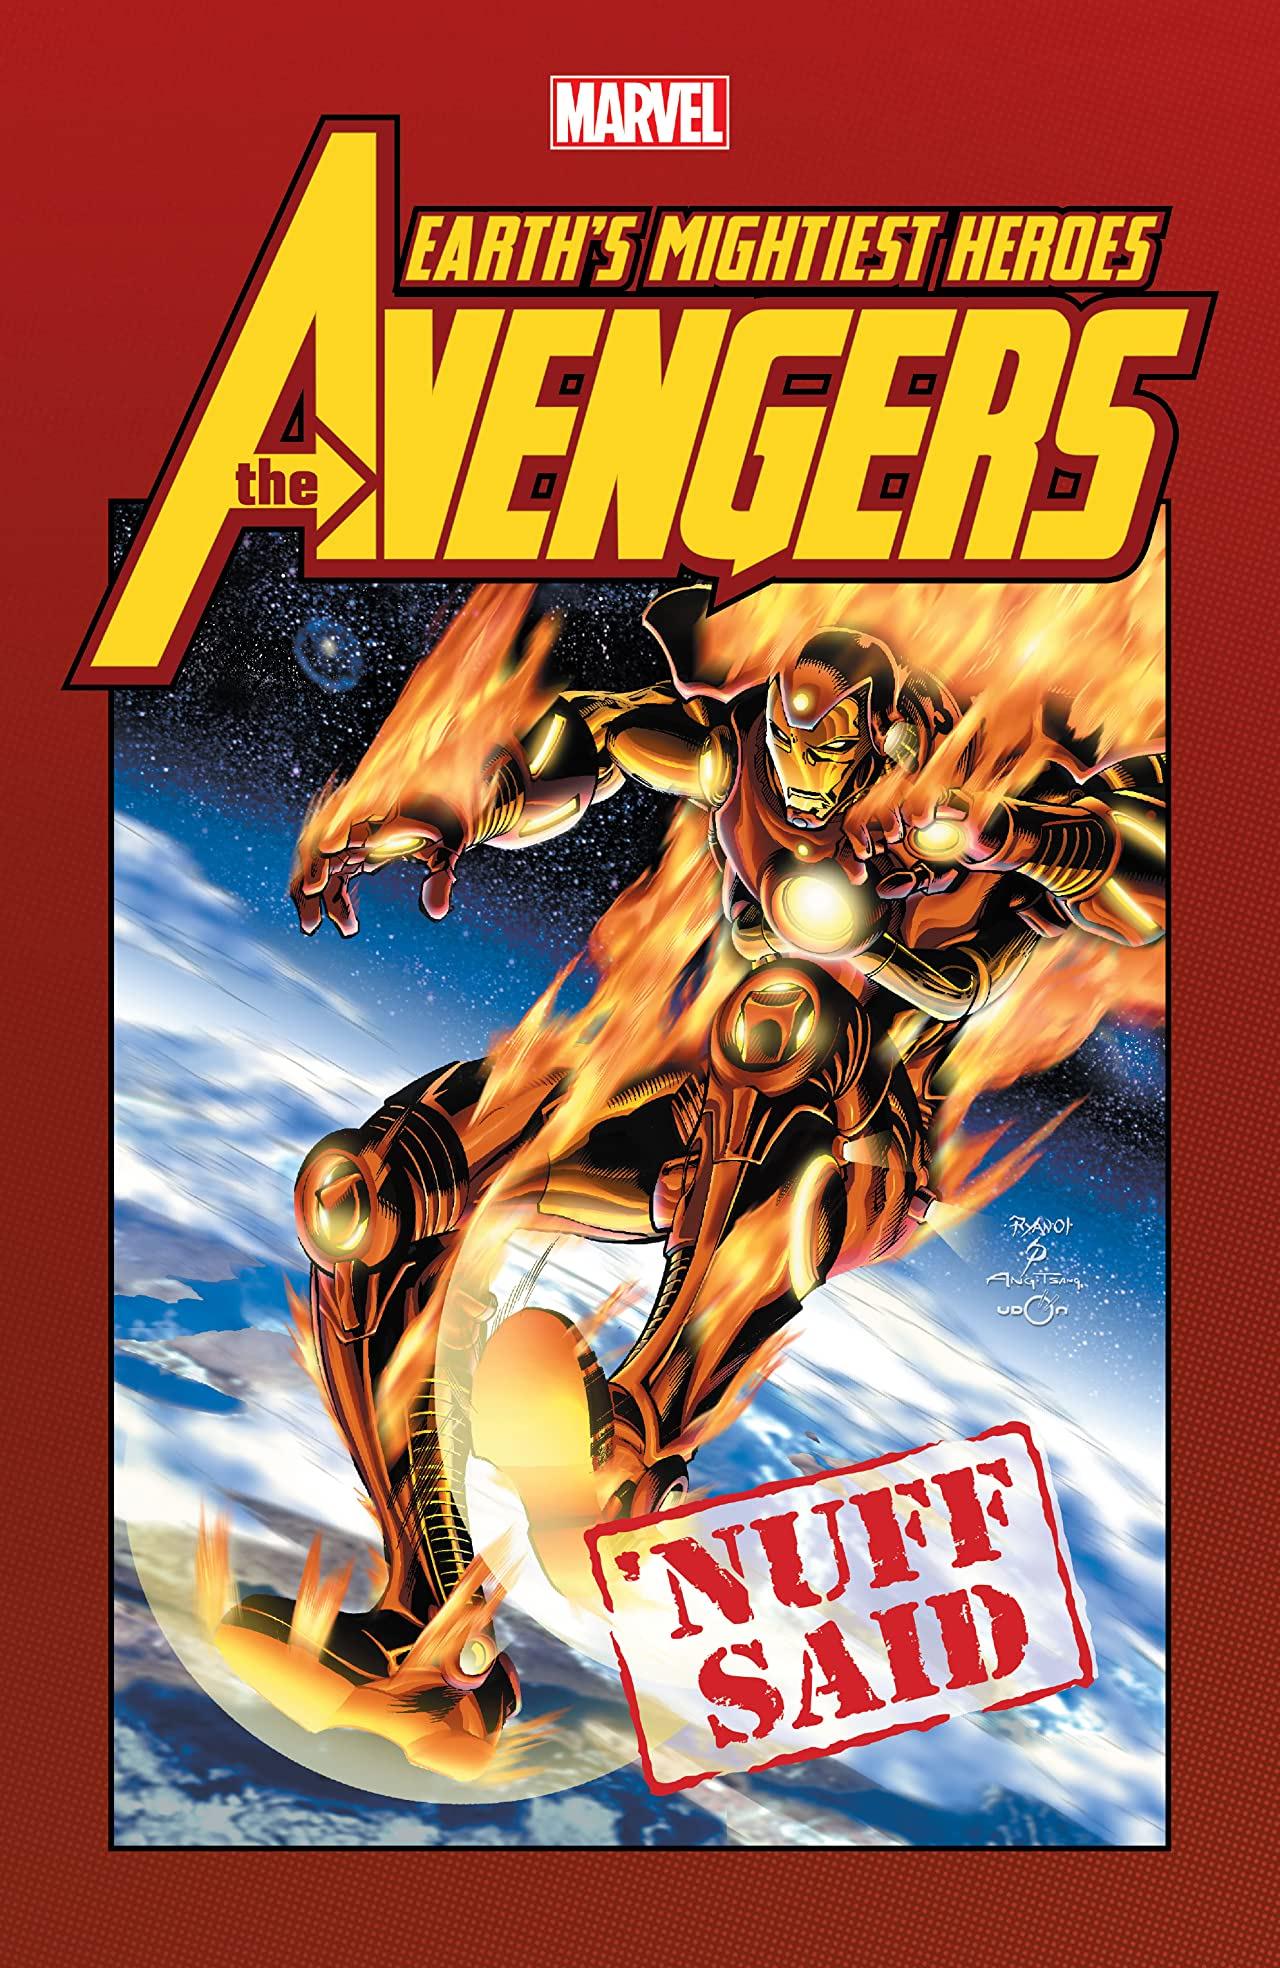 Avengers: Nuff Said (2020)